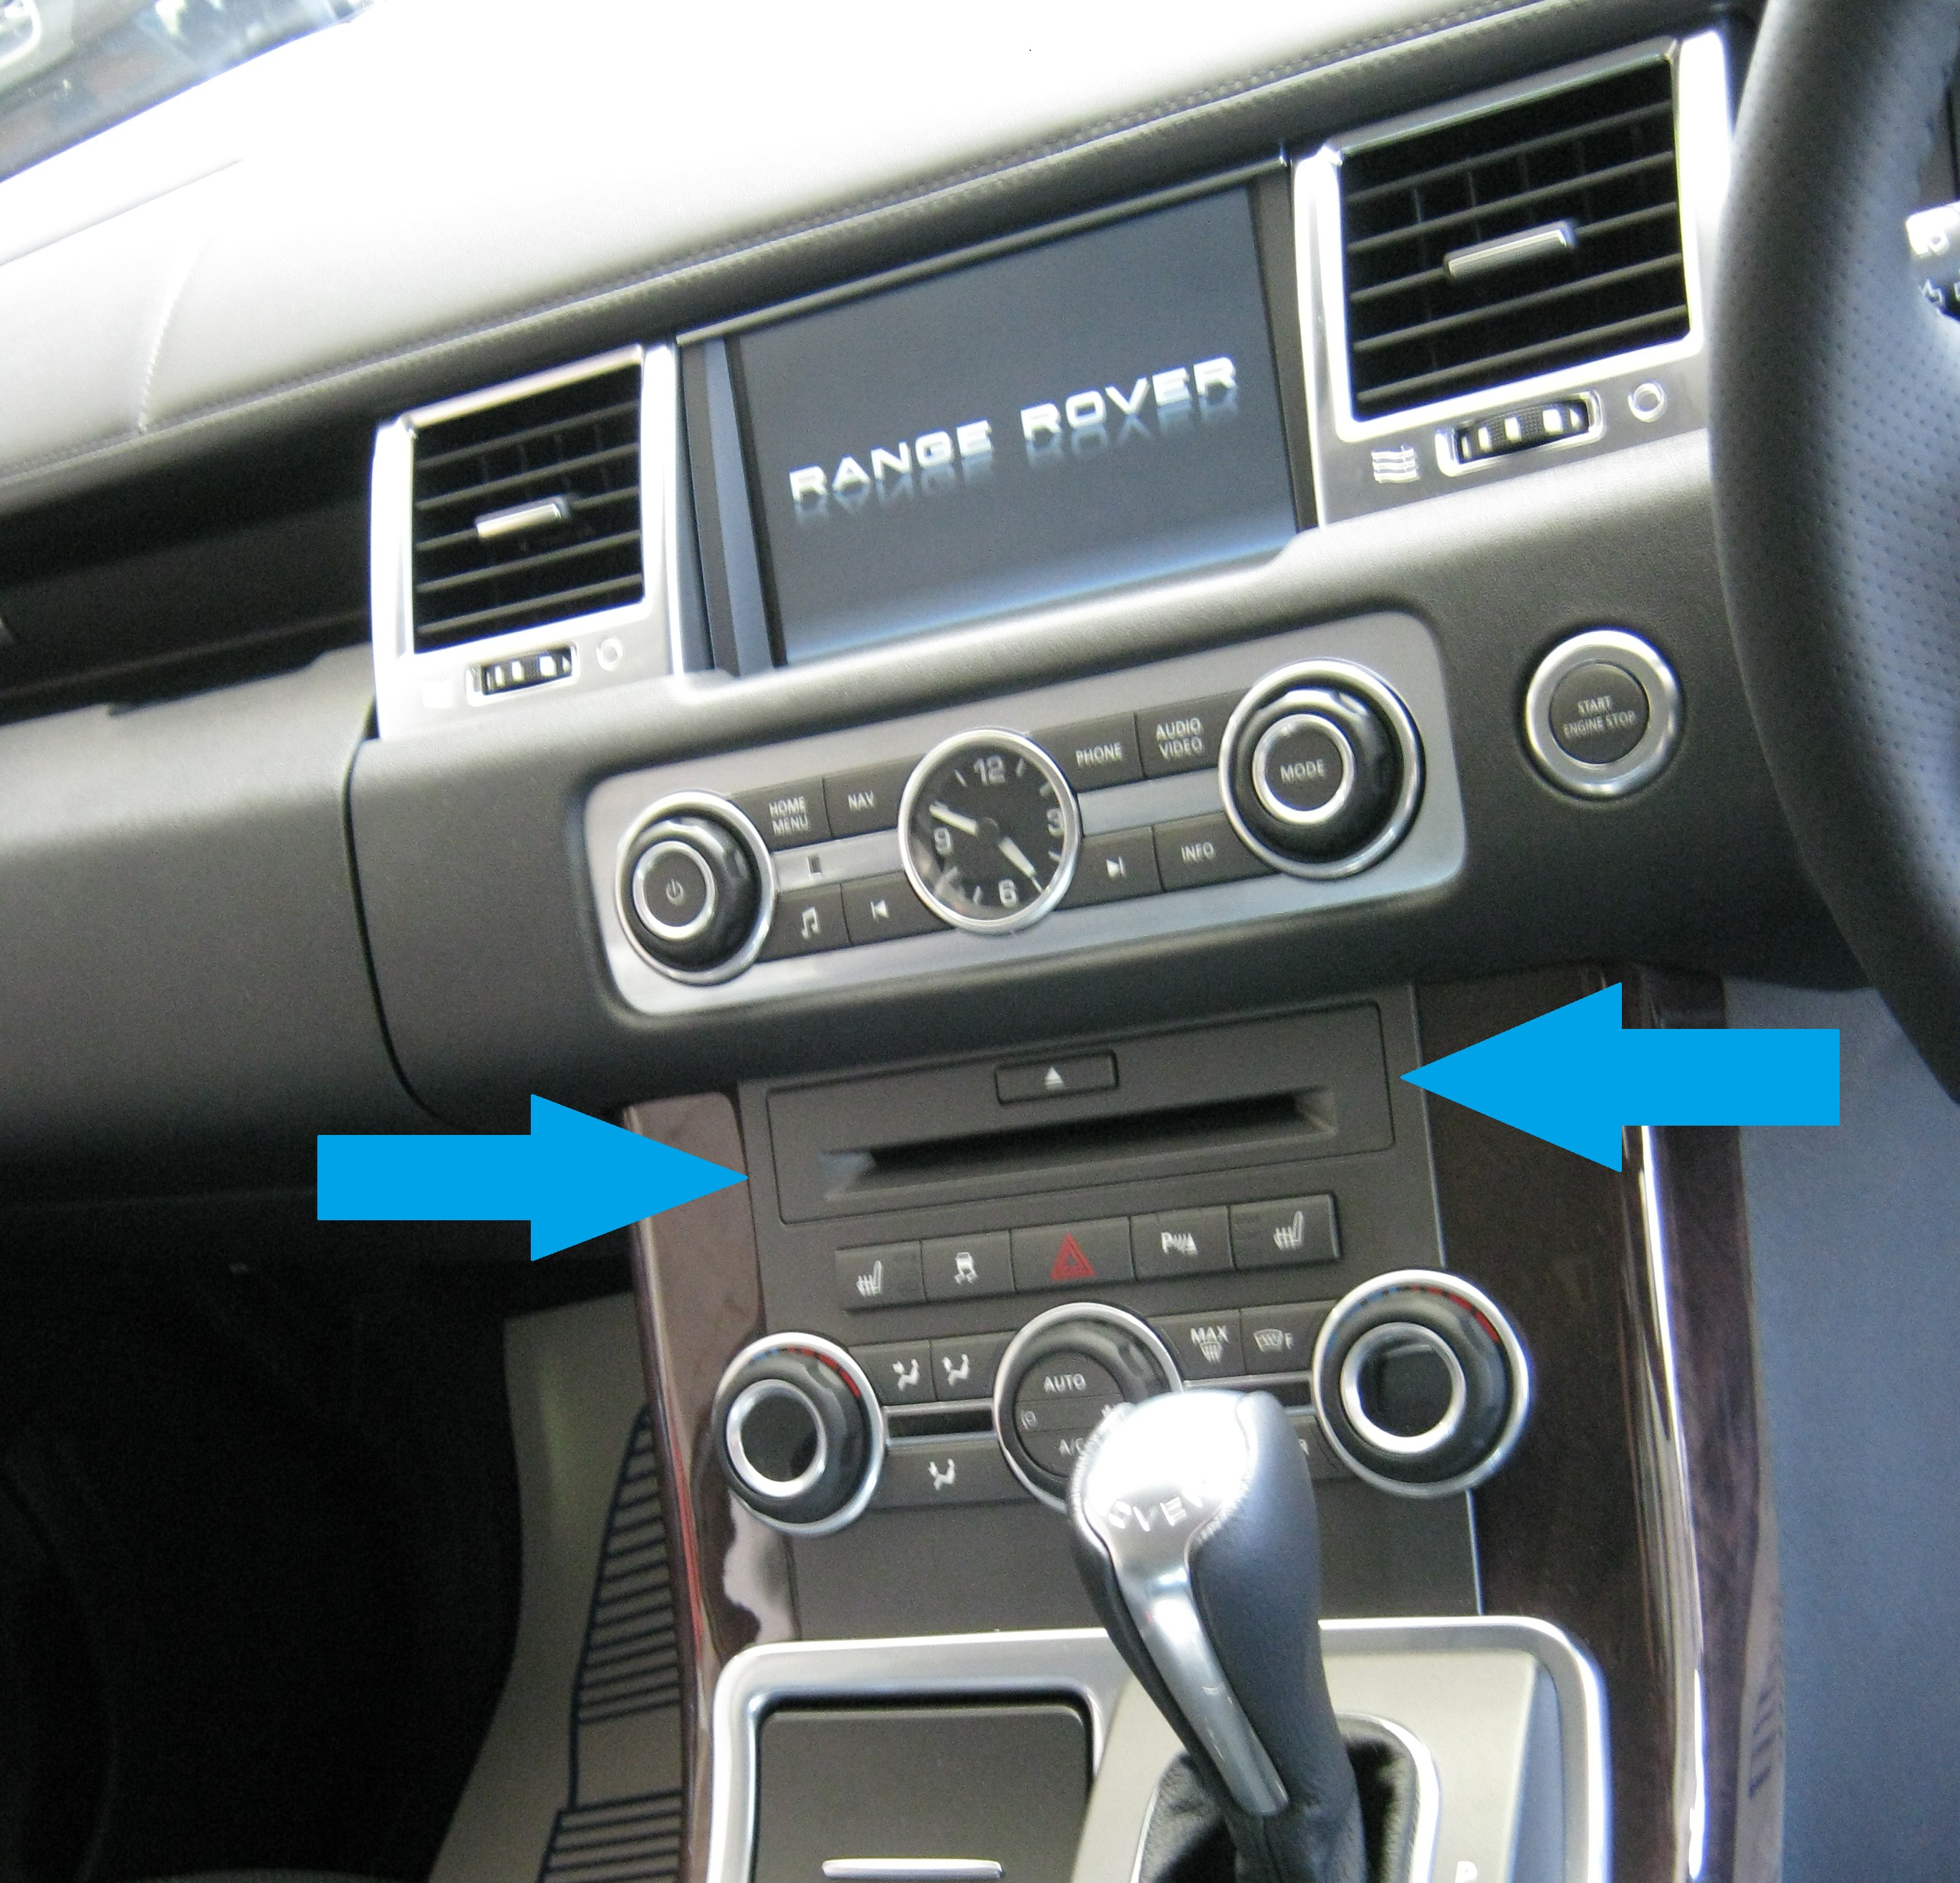 2002 Land Rover Range Rover Interior: Black Carbon Fibre Fiber Centre Dash CD Fascia Range Rover